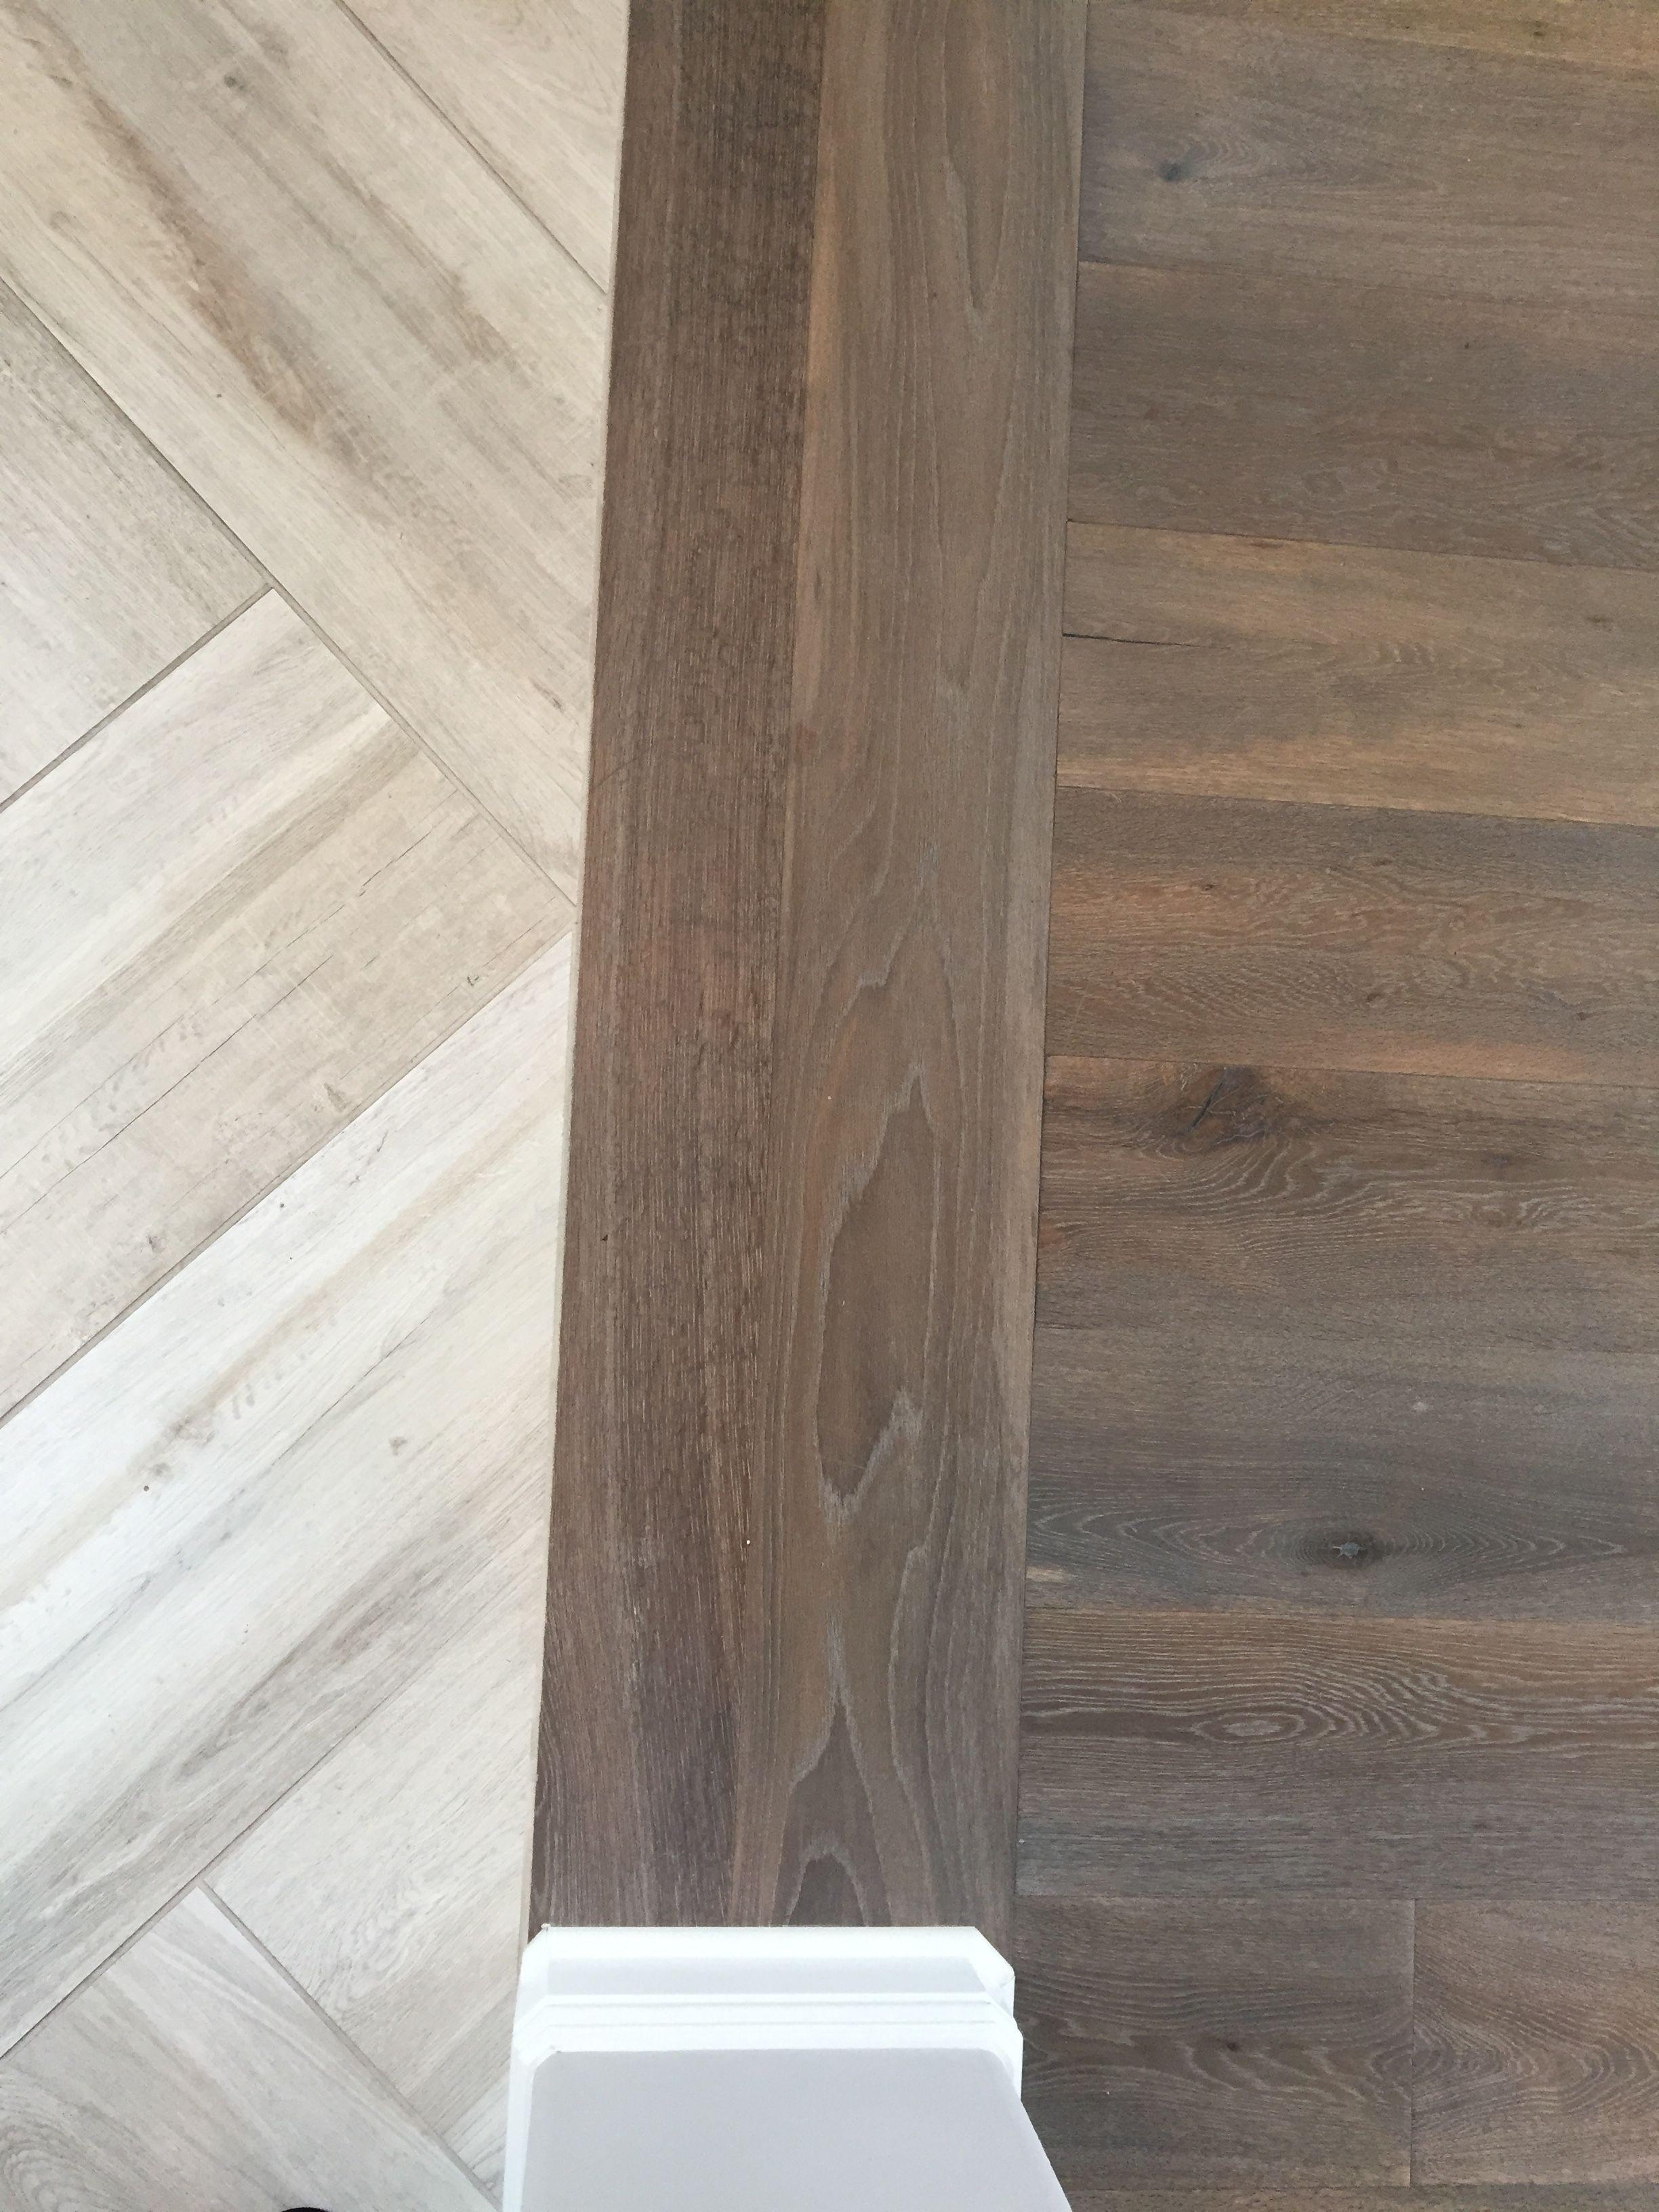 hardwood floor repair san antonio of 30 inspirational laminate flooring transition photos flooring for laminate flooring transition elegant 12 best bathroom transition strip image of 30 inspirational laminate flooring transition